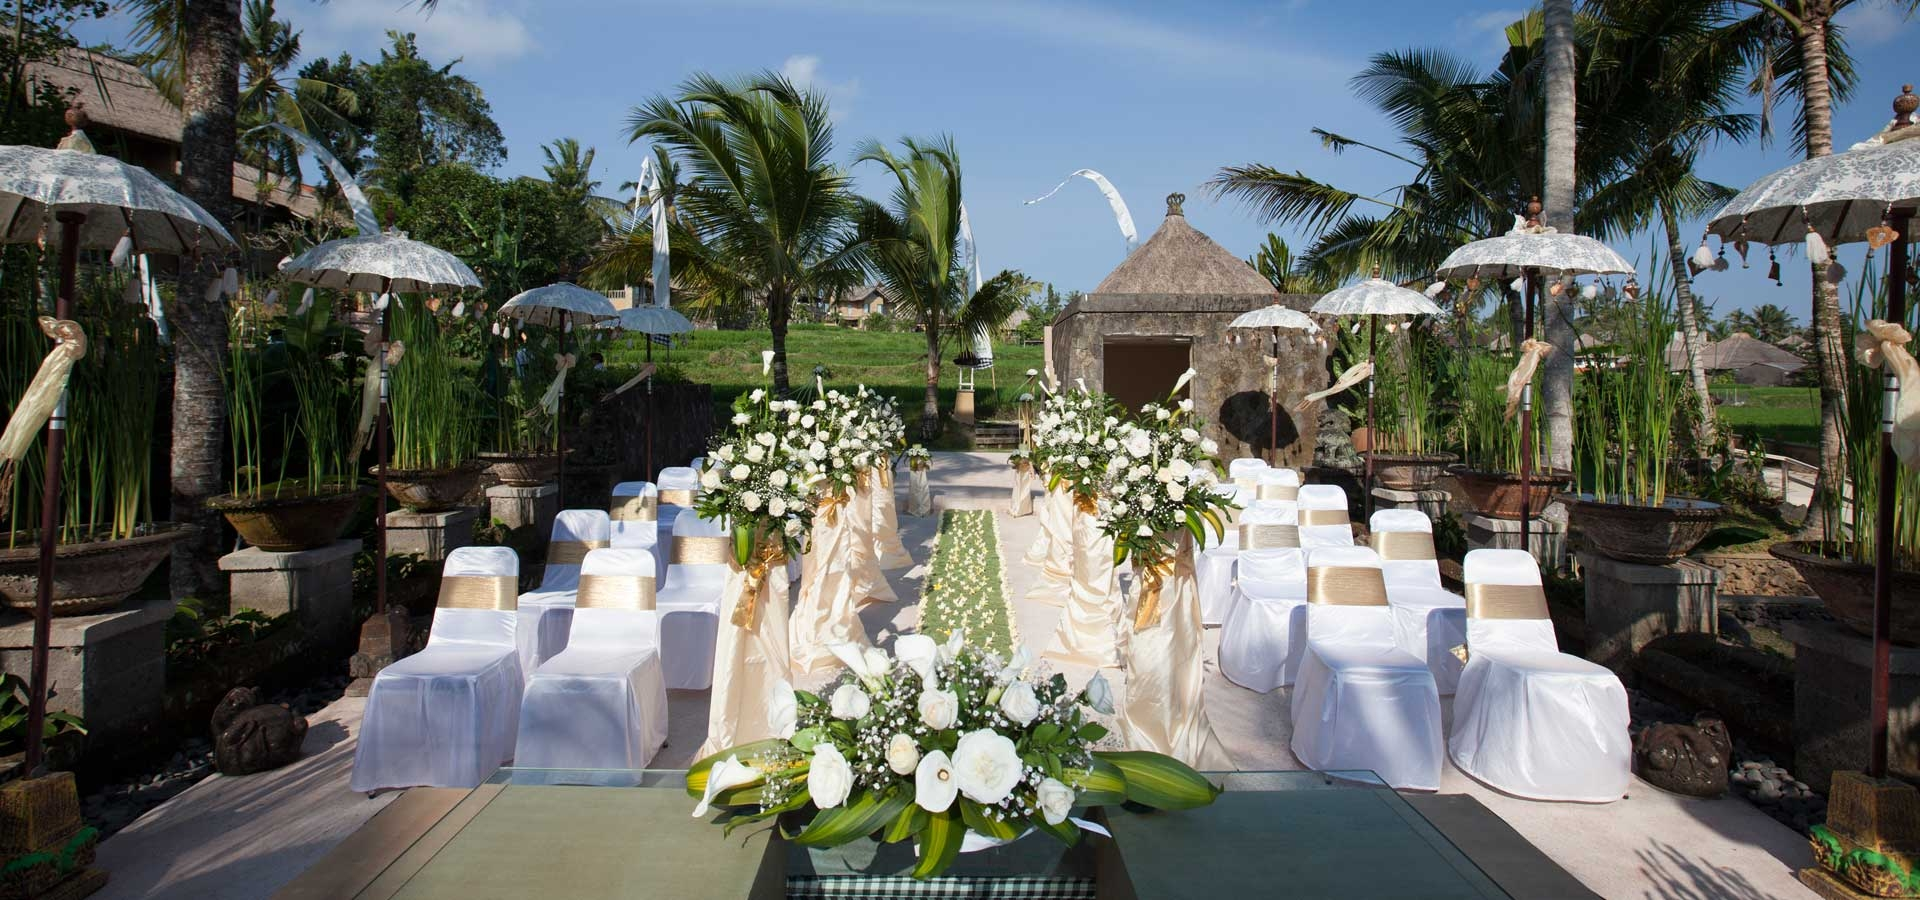 Wapa-Di-Ume-Ubud-Sayan-Wedding-Packages